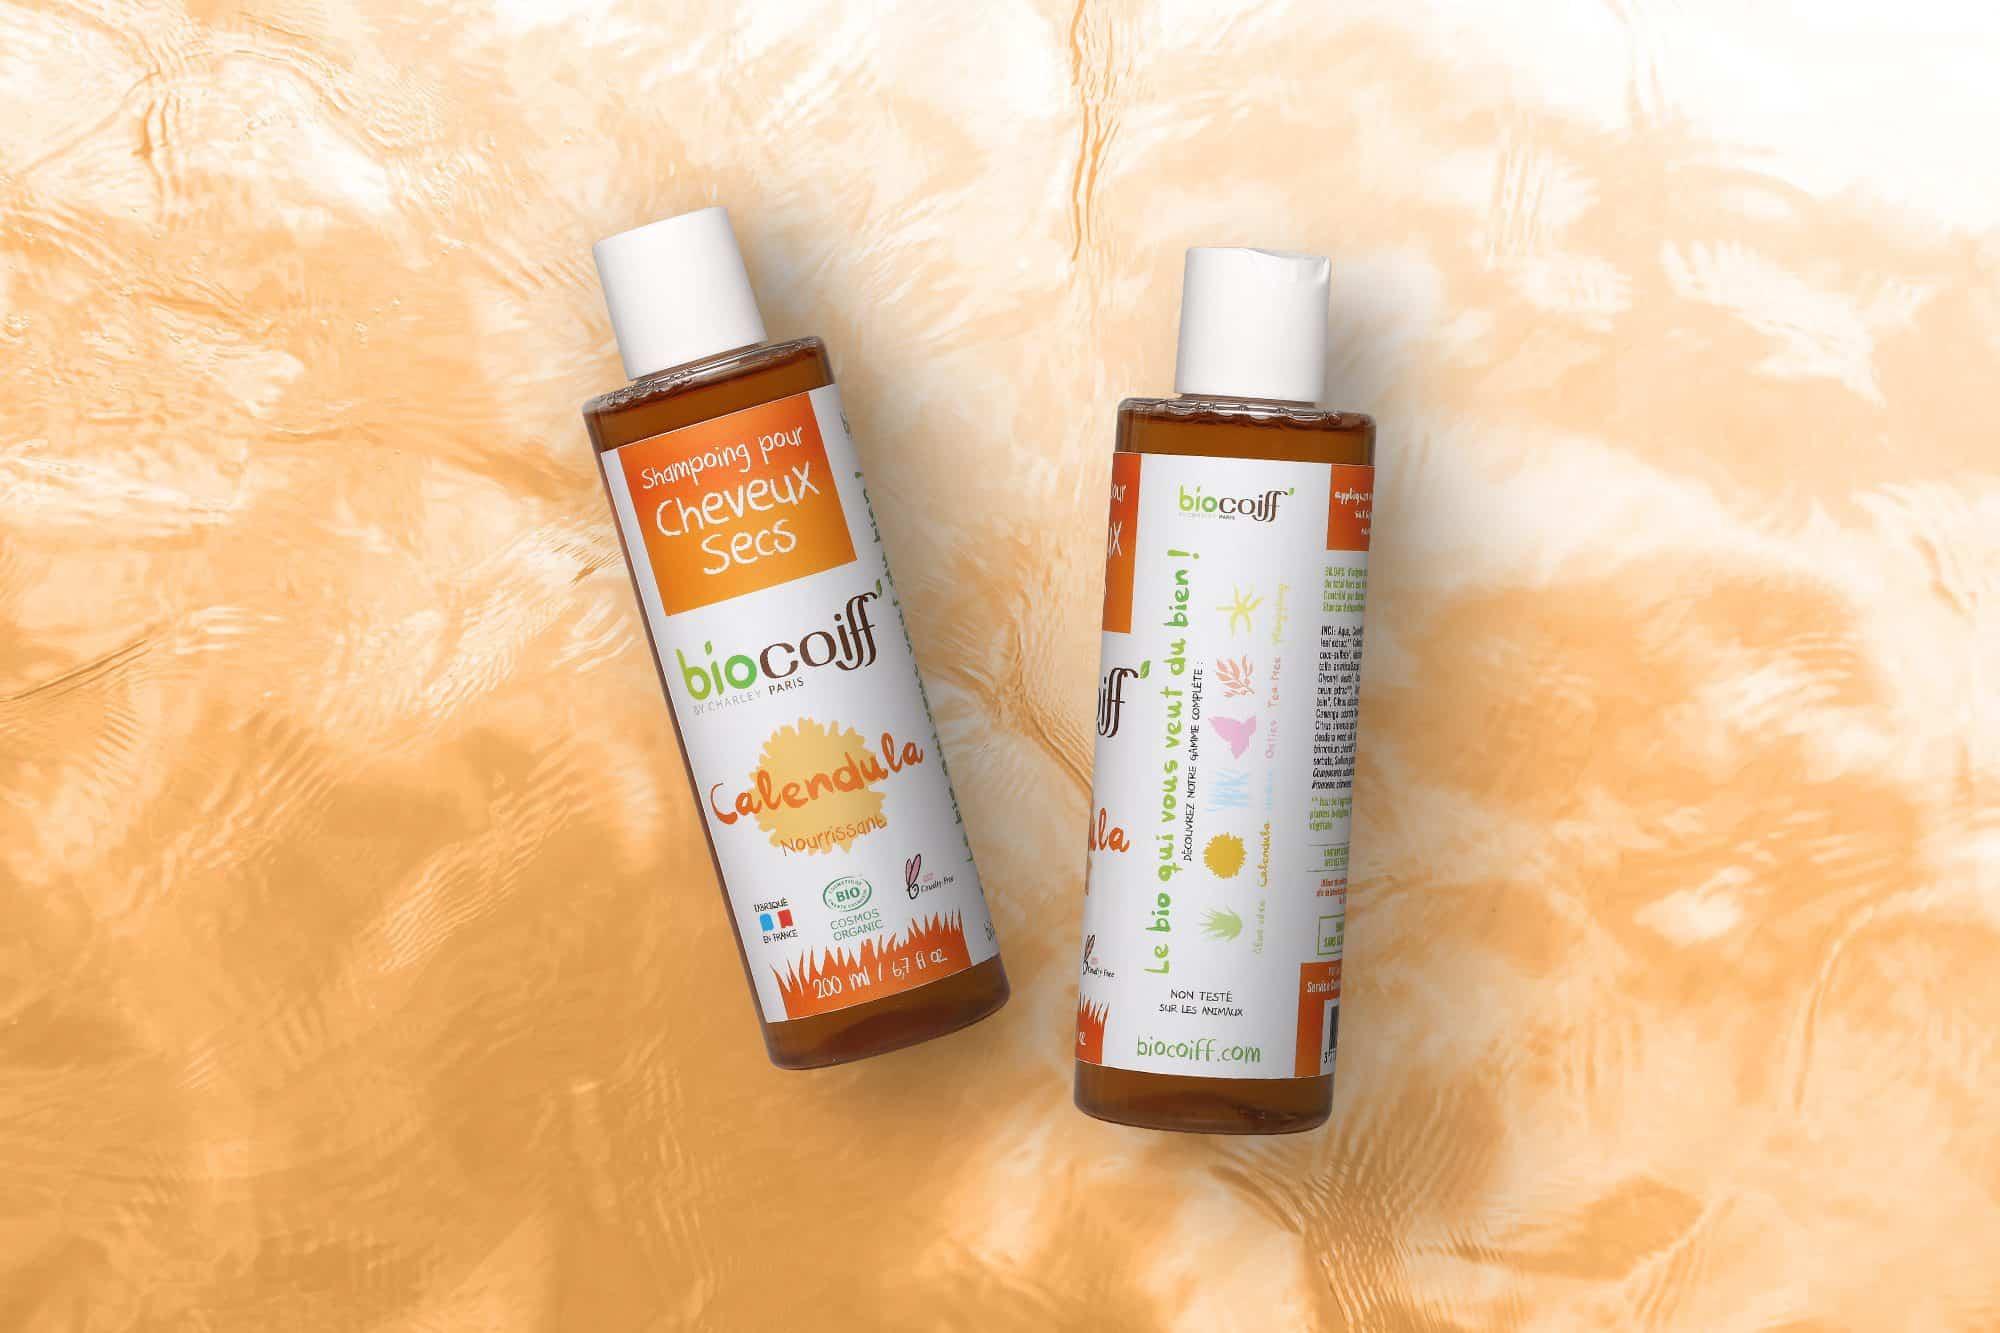 Shampoing bio au calendula par Biocoiff